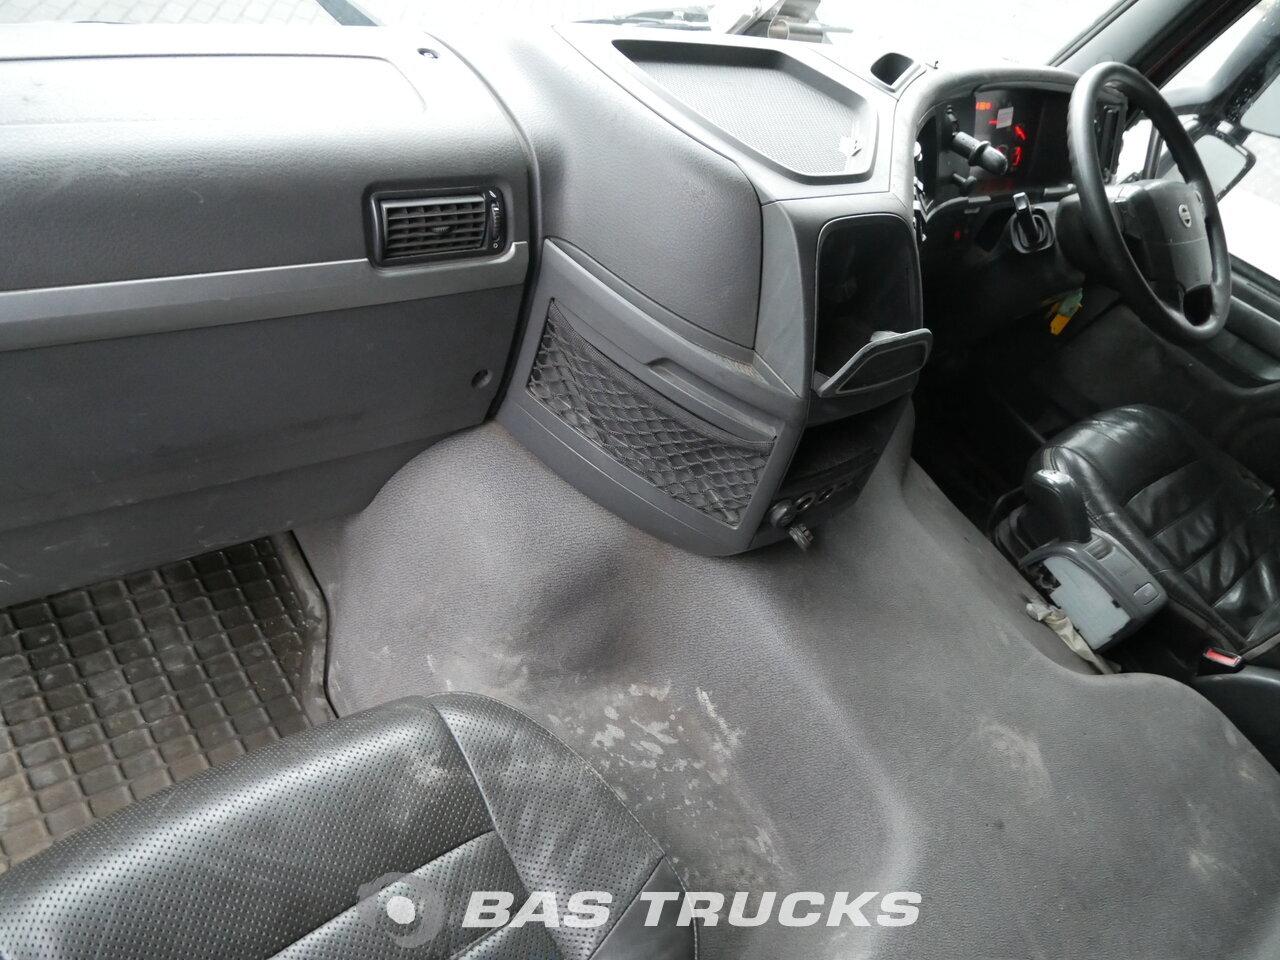 photo de Occasion Tracteur Volvo FM 430 RHD Unfall Fahrbereit 6X2 2009